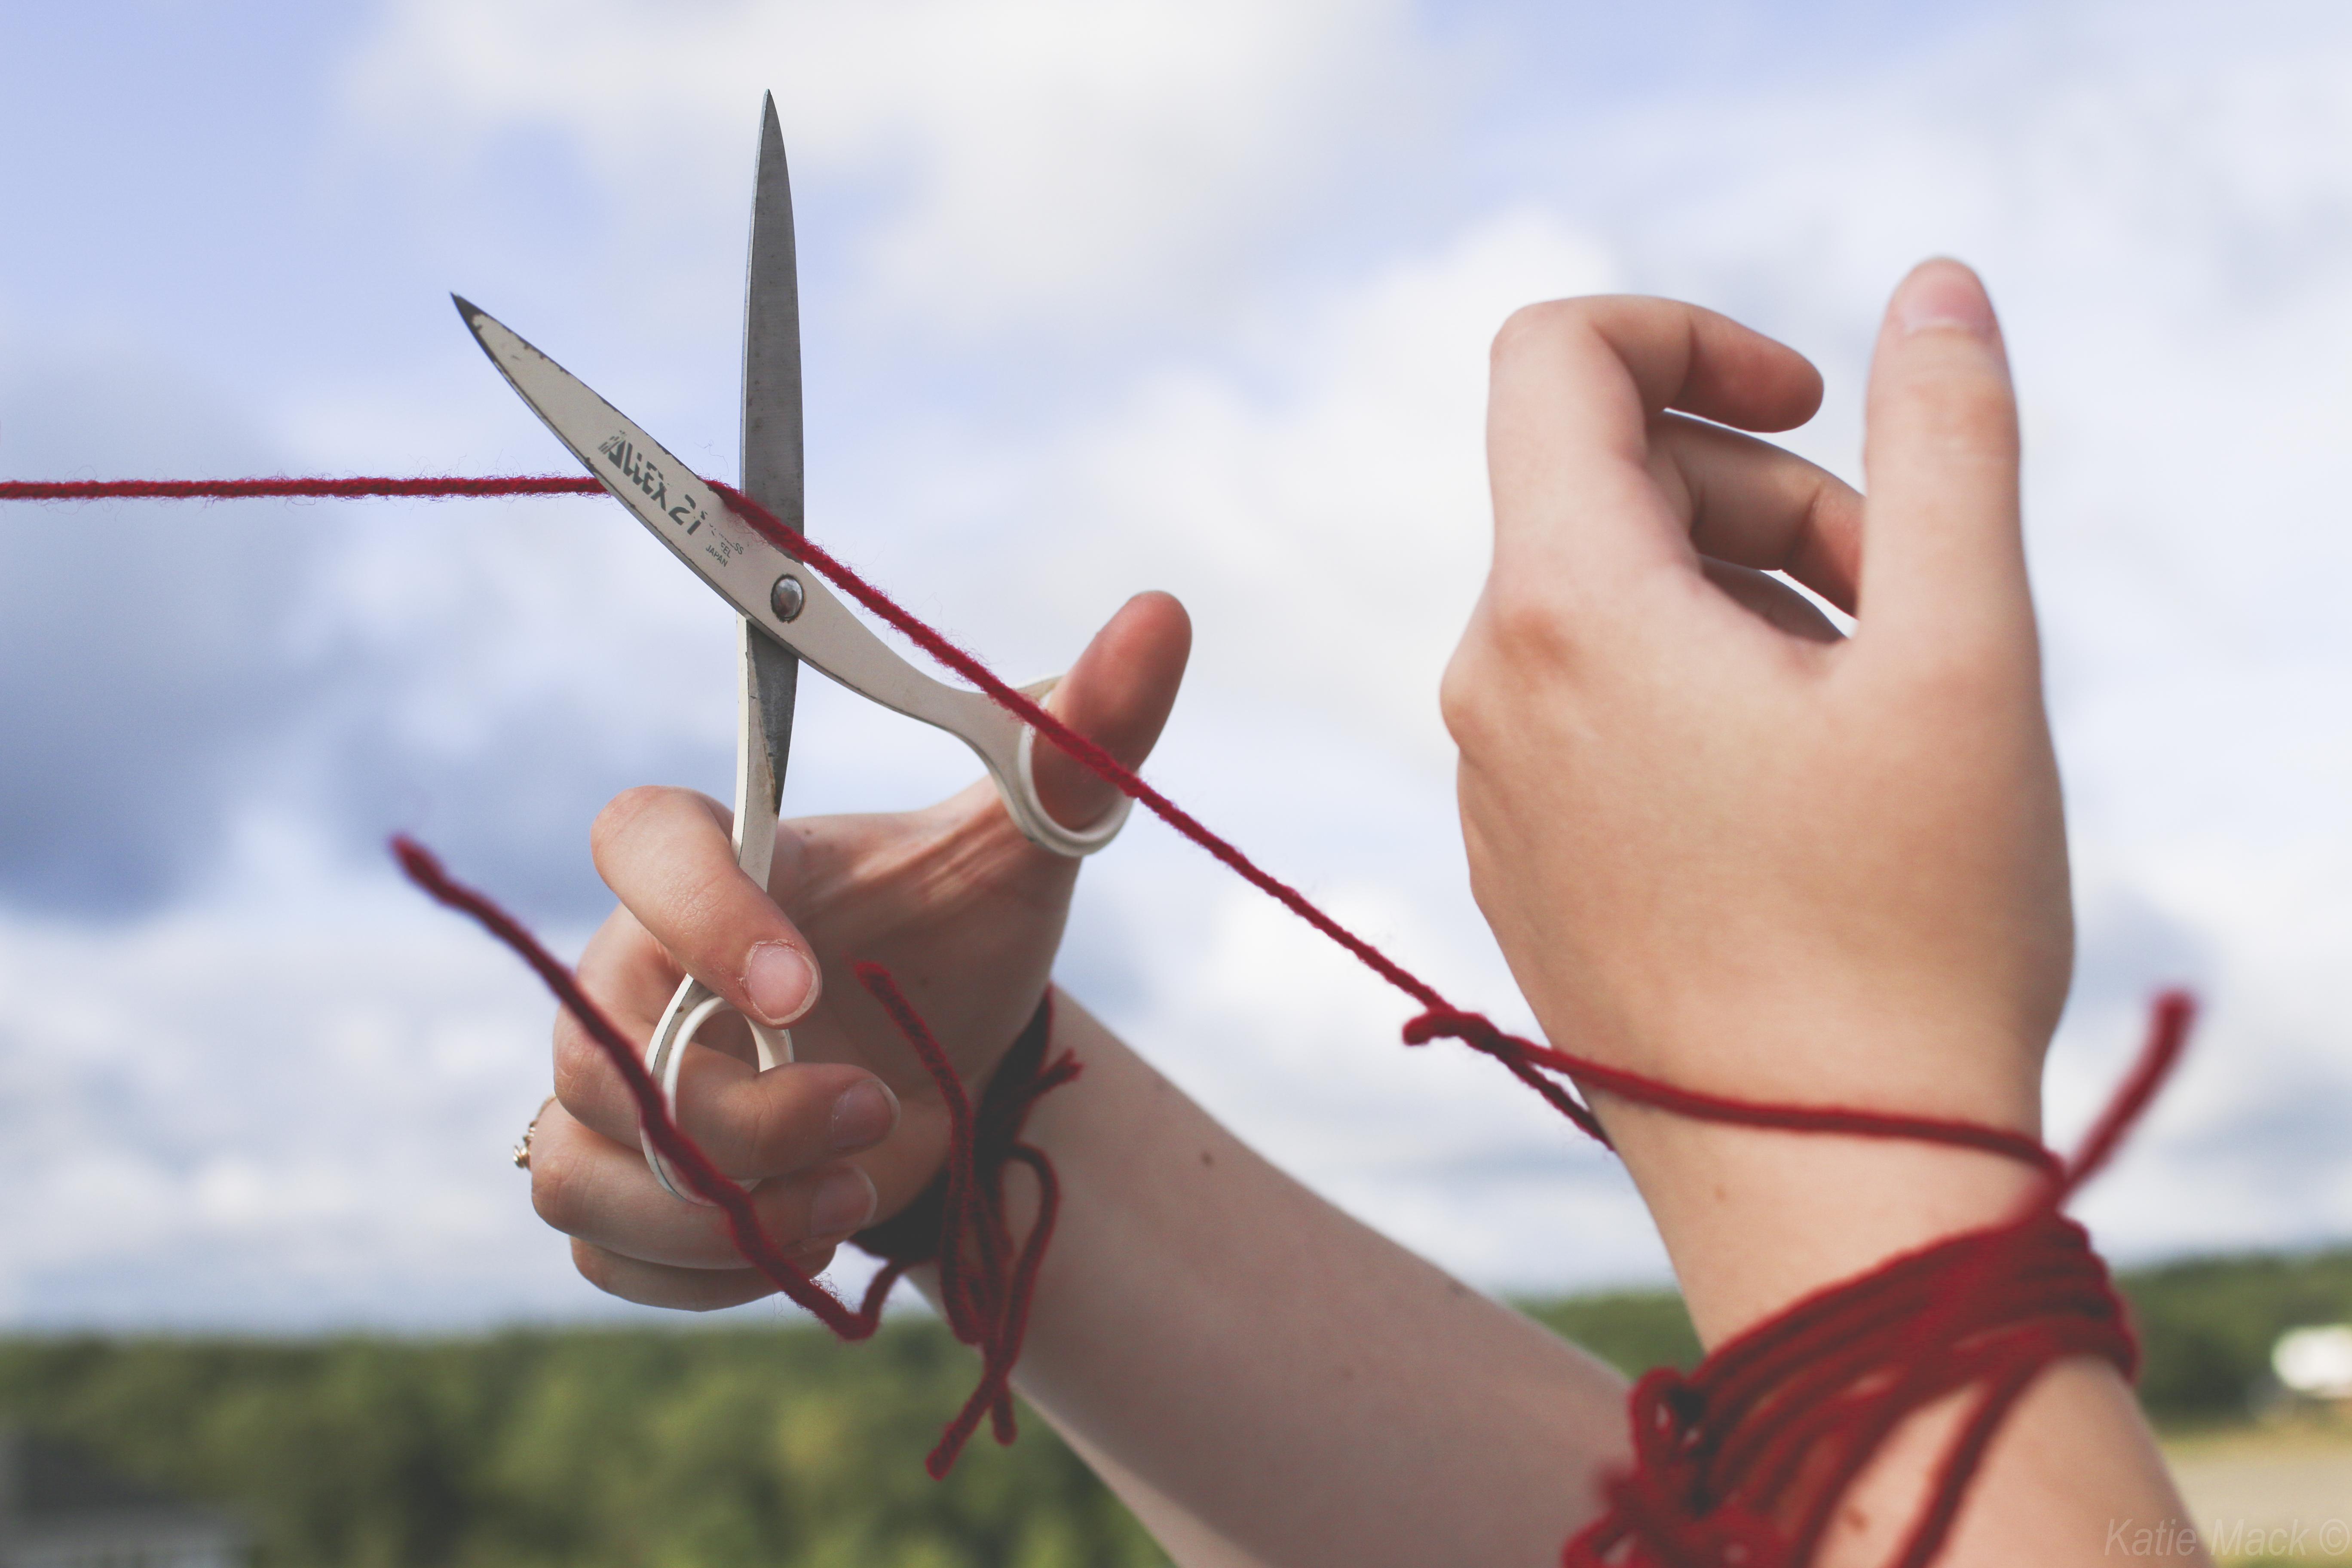 Best Wallpaper Friendship Finger - hands-sky-friendship-bokeh-scissors-Conceptual-girl-hand-fun-nail-finger-string-arm-52-thumb-katiemackphotography-766449  You Should Have_25917 .jpg